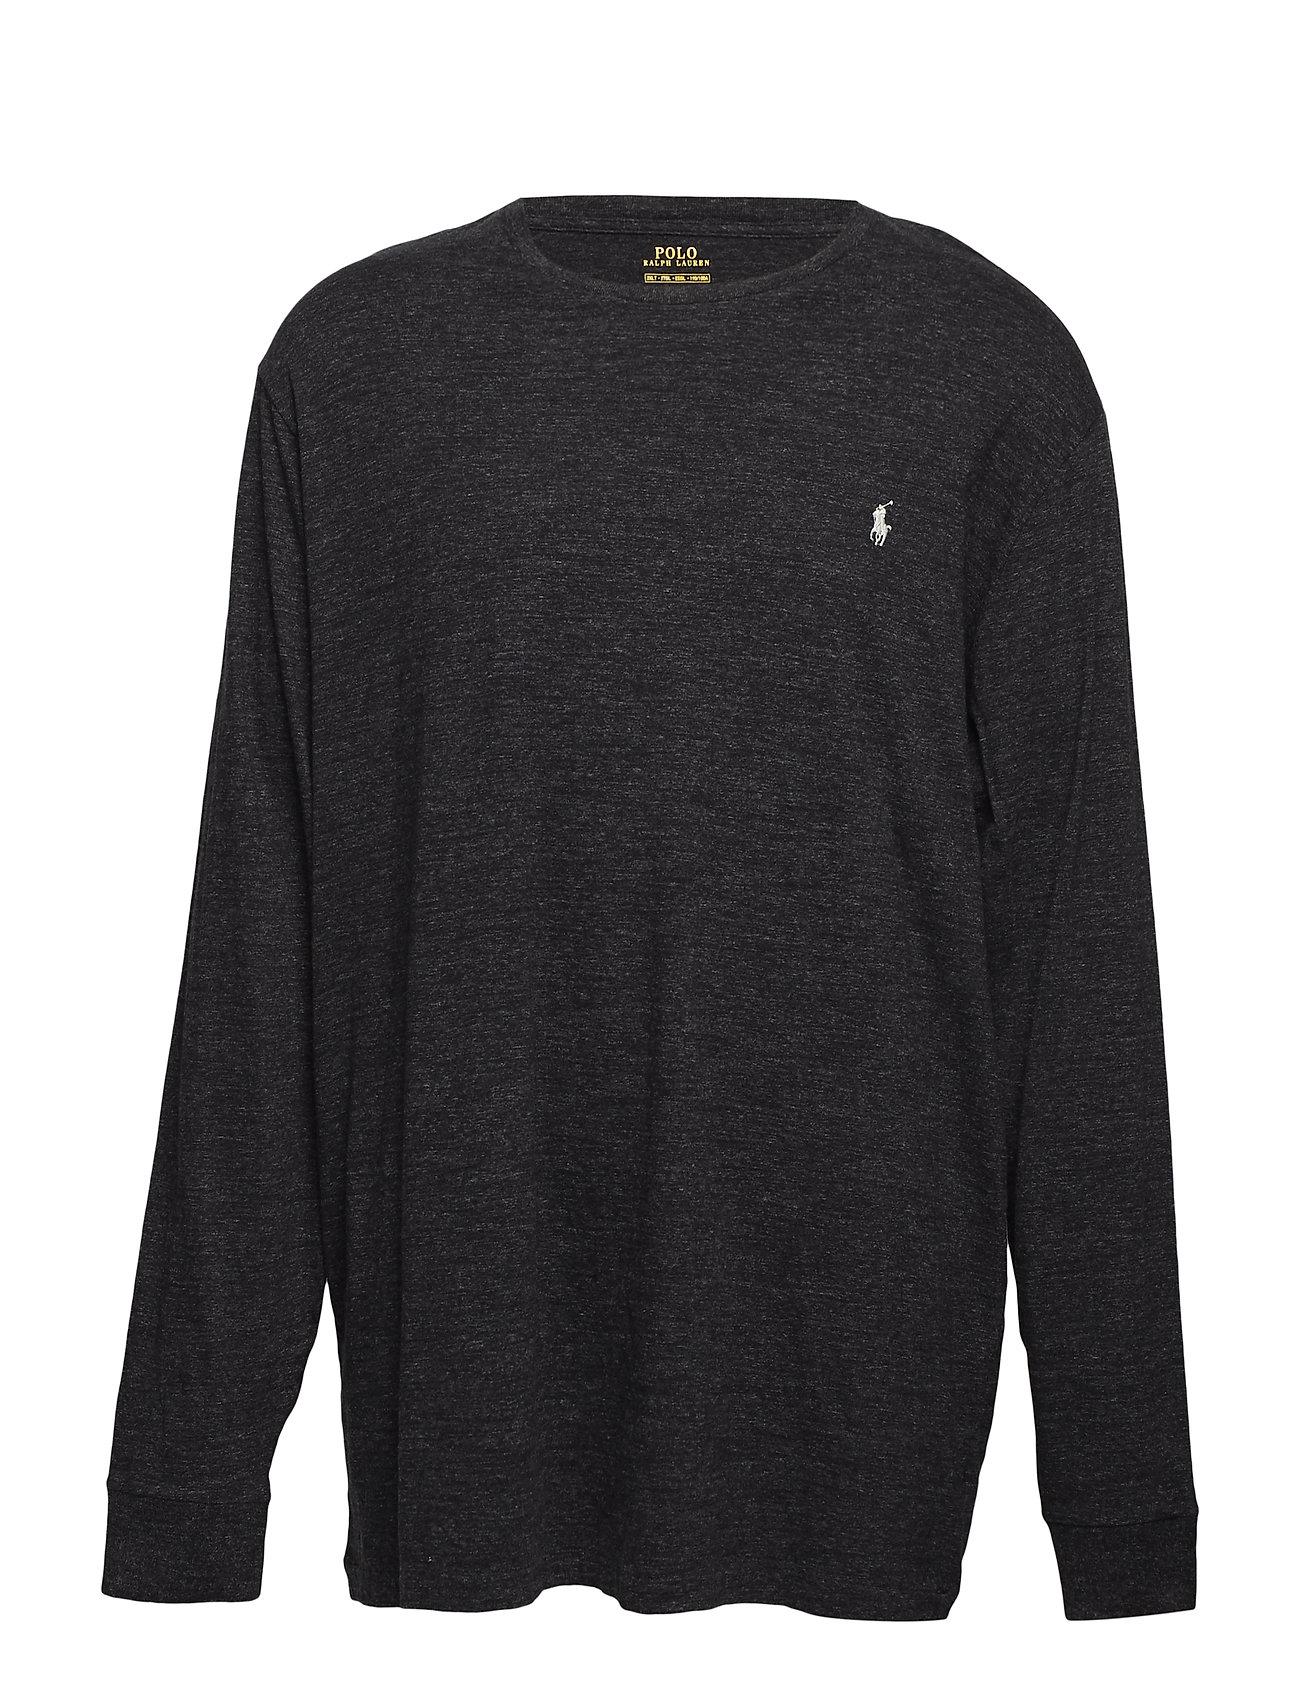 Polo Ralph Lauren Big & Tall Classic Fit Crewneck T Shirt Ögrönlar